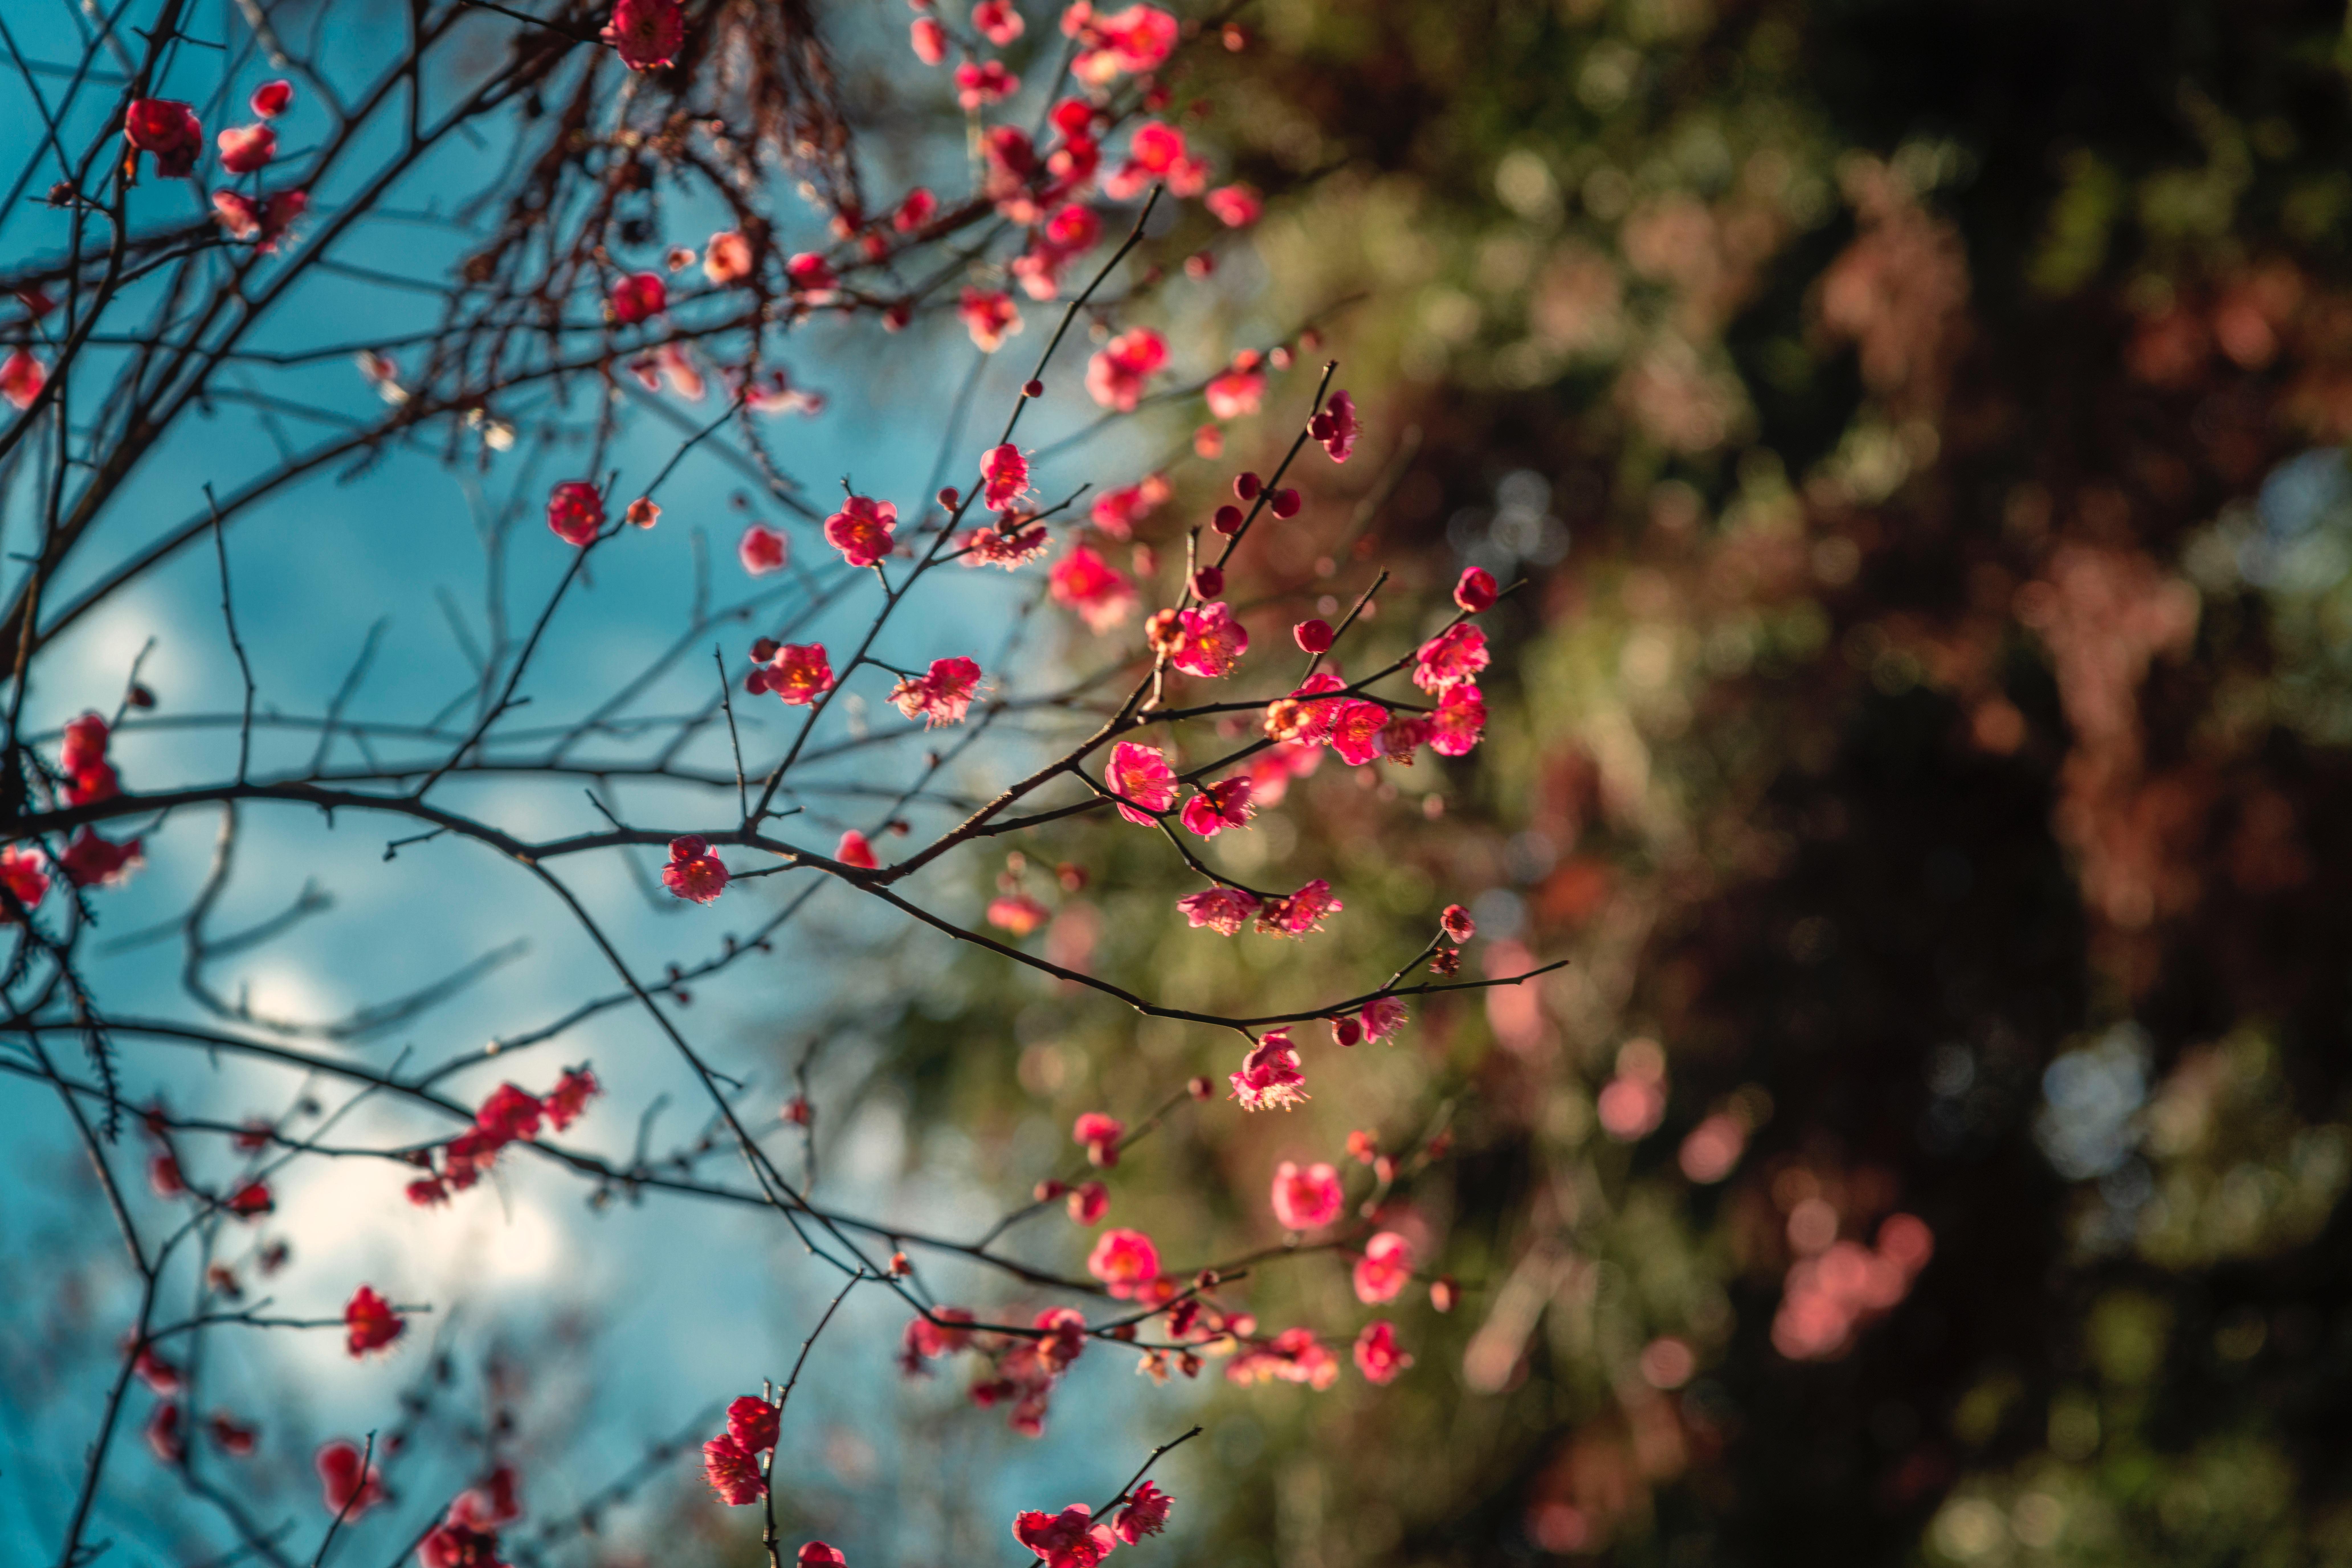 blossom petal flowers 1574937756 - Blossom Petal Flowers -